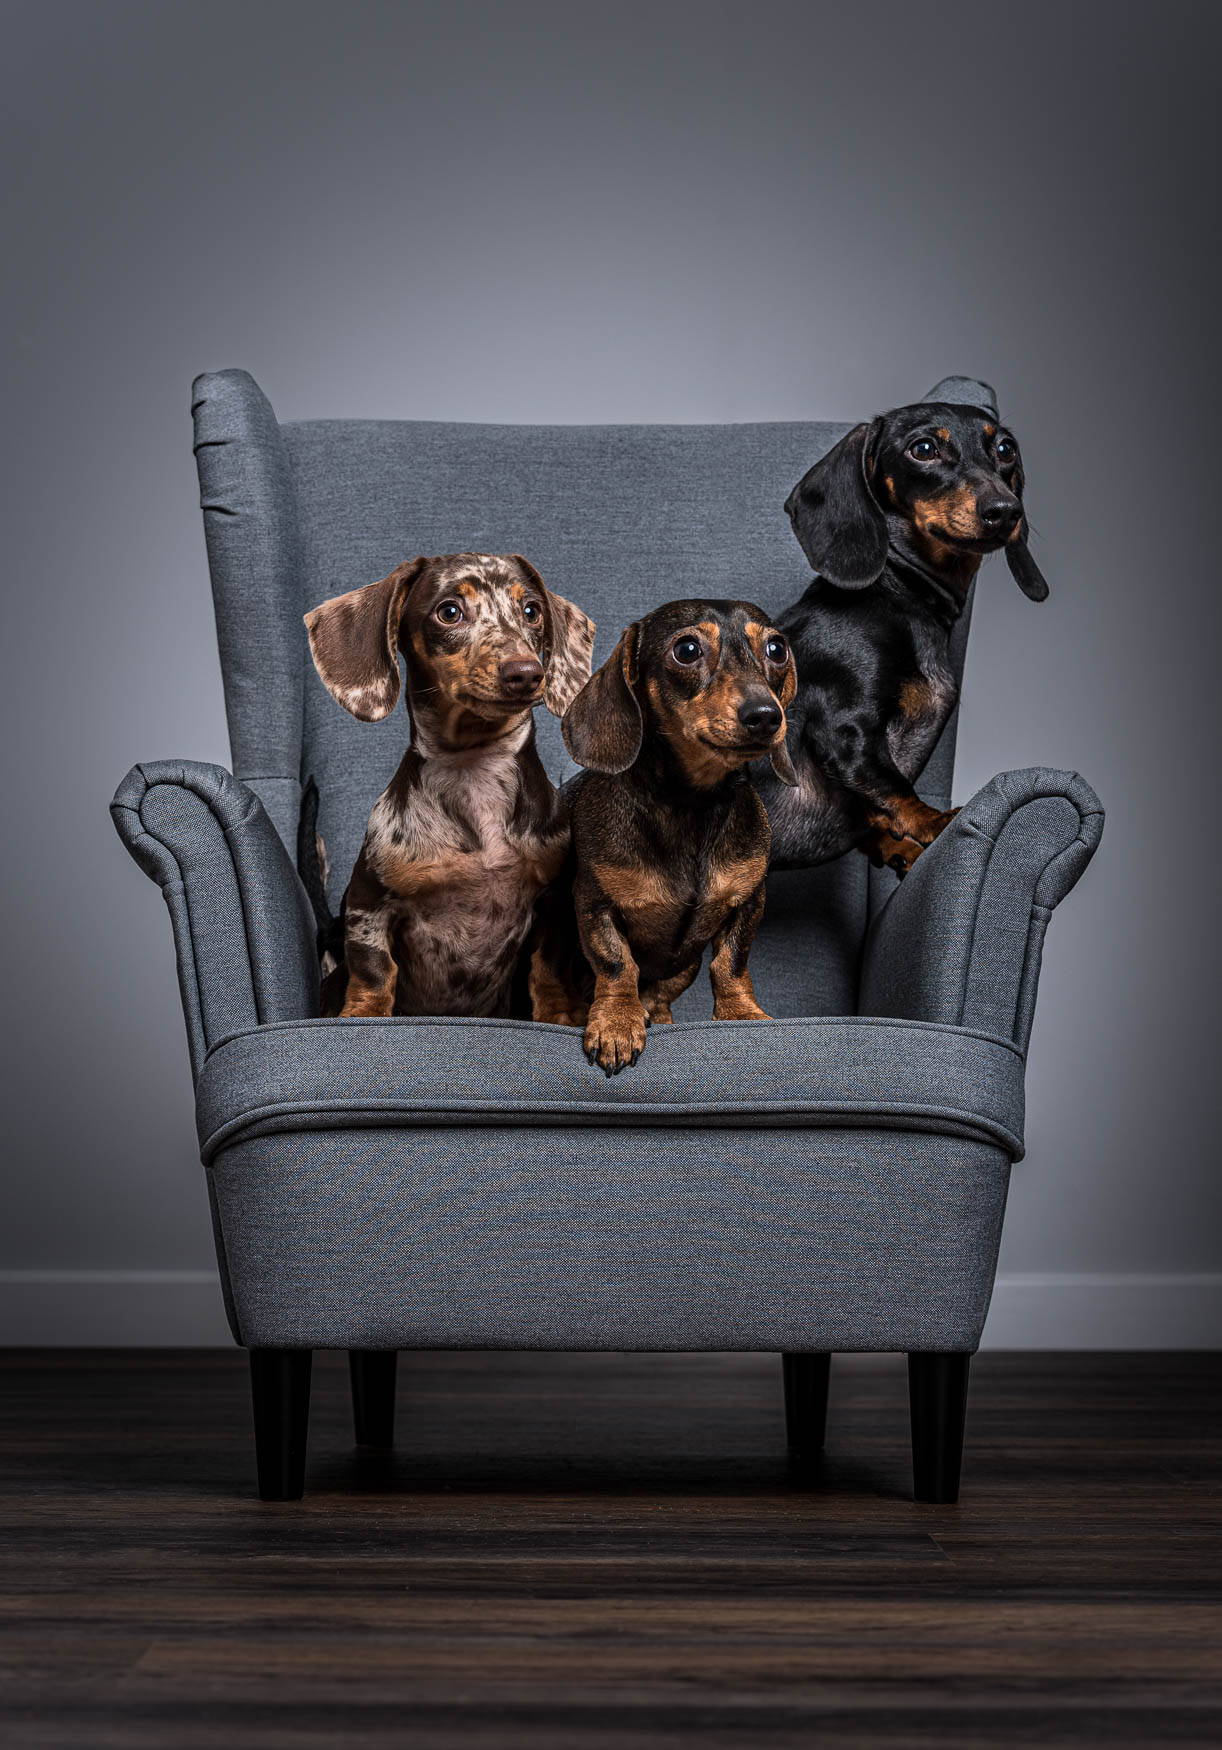 Fine art studio dog photographer Yorkshire - Dapple black and tan Miniature Dachshund puppies